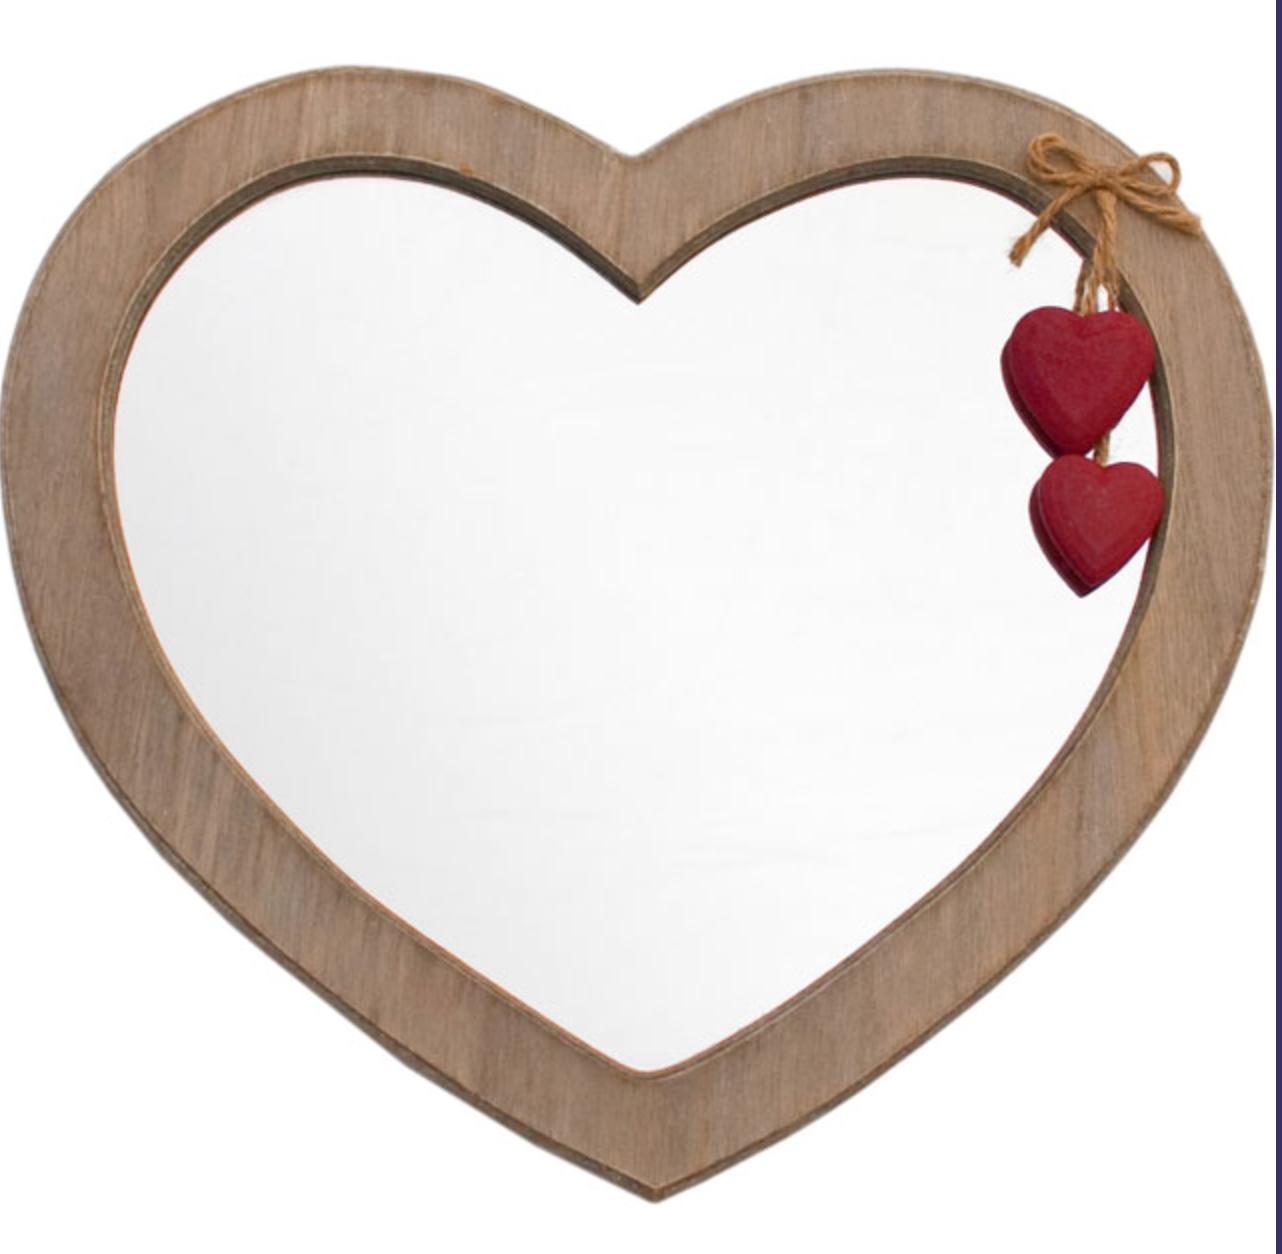 Wooden Frame Heart Shaped Mirror Wooden Mirror Heart Decorations Heart Mirror